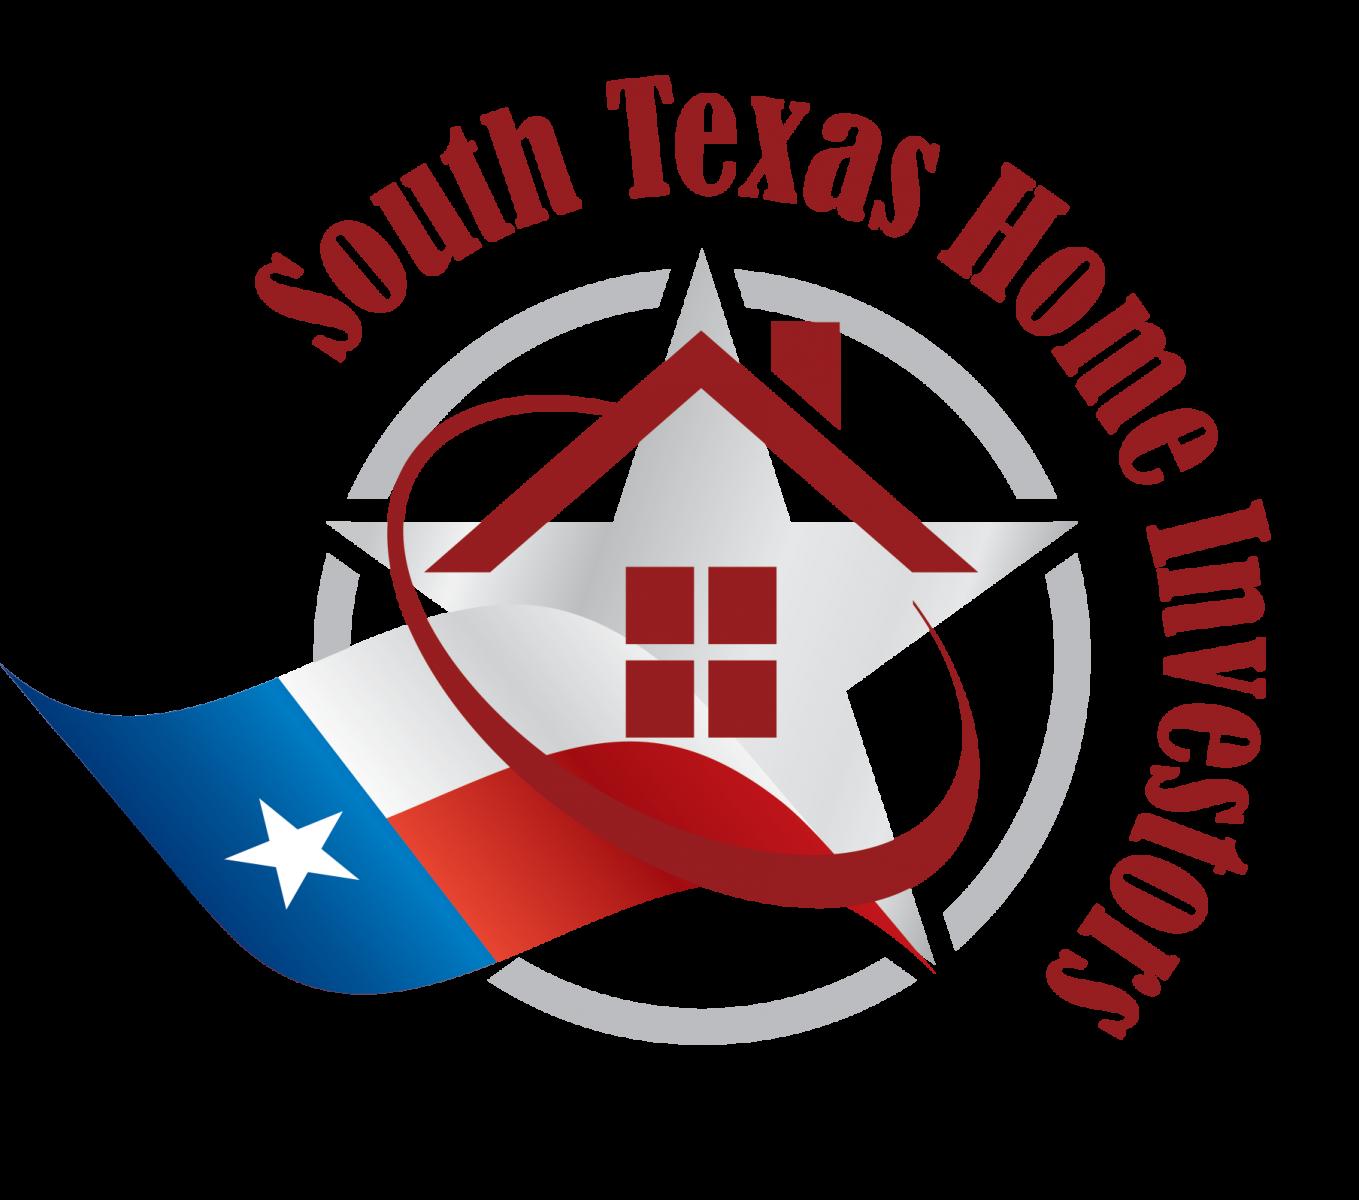 We Buy Houses San Antonio – Sell My House Fast San Antonio logo